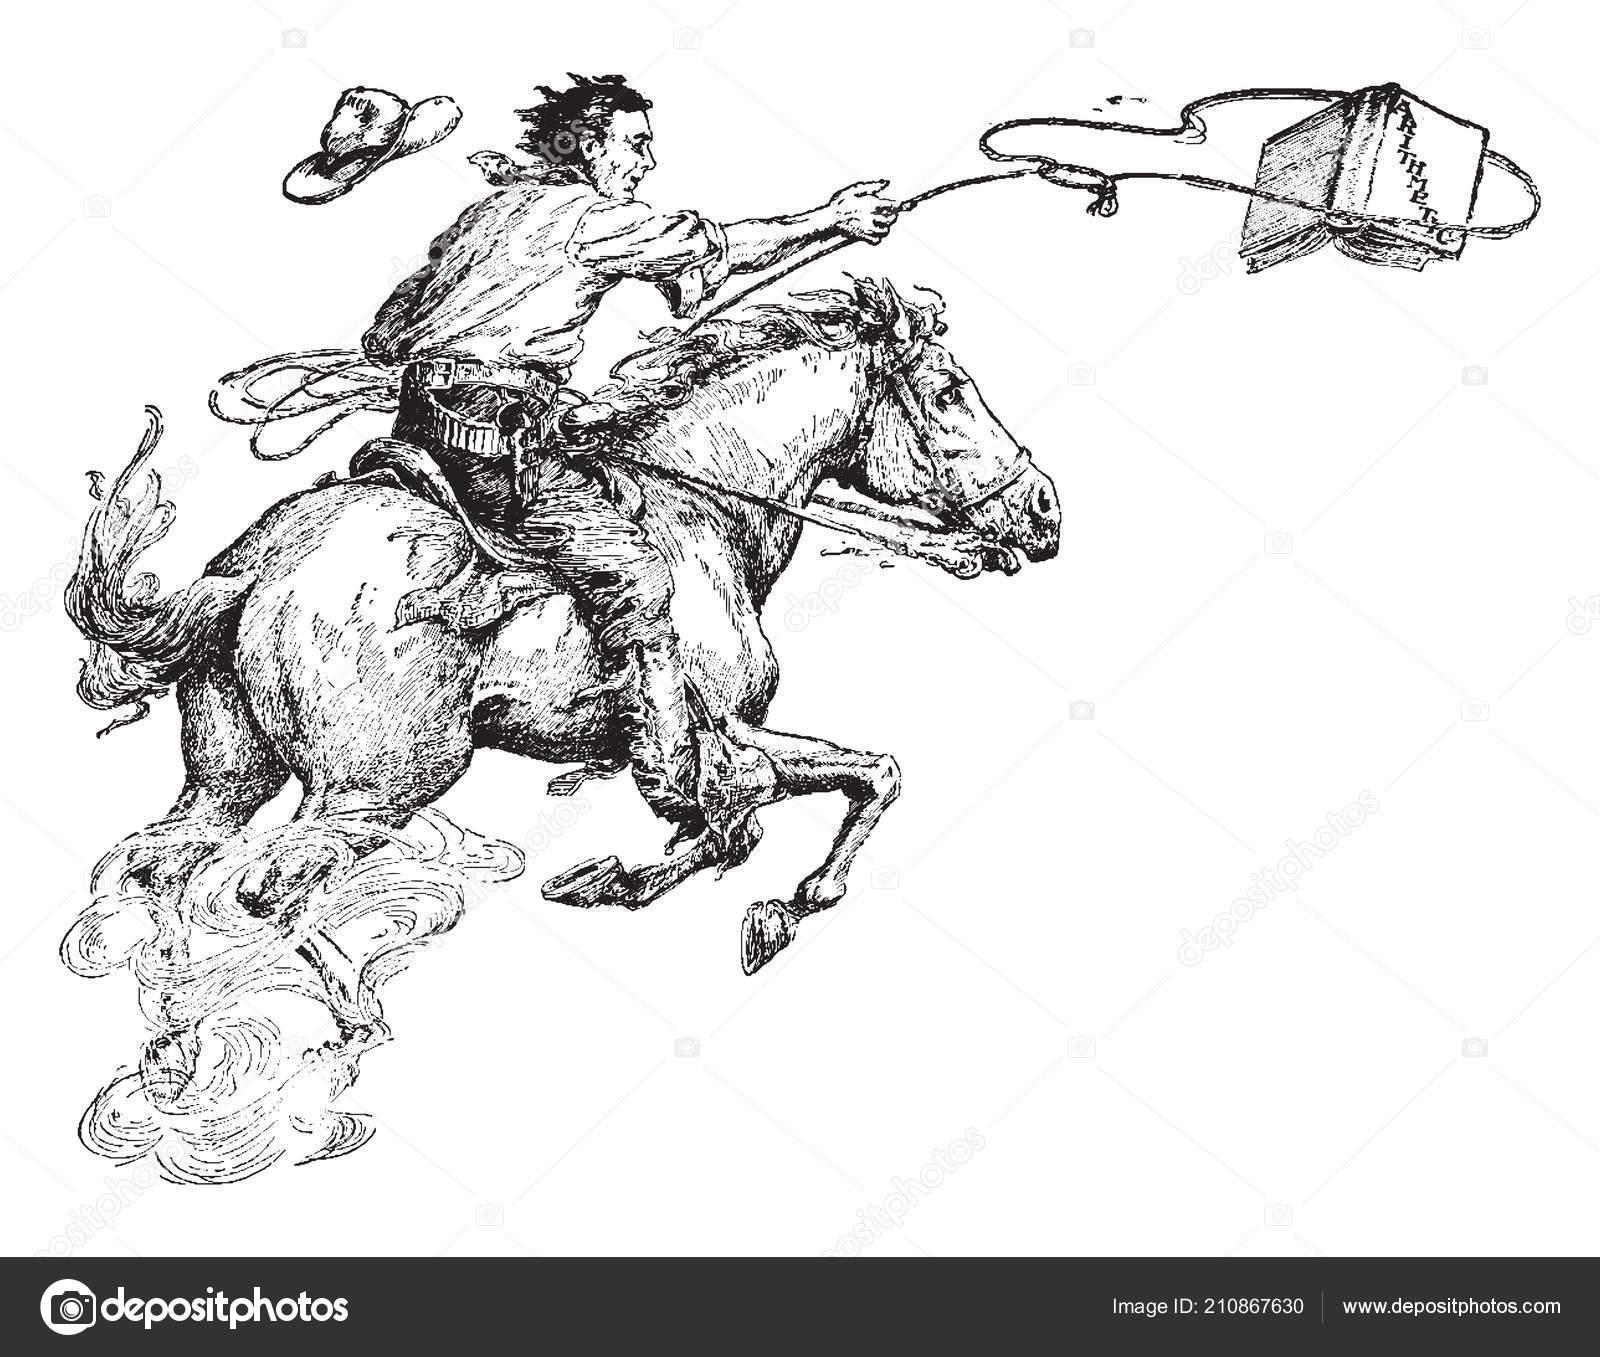 Man Lassoing Book Arithmetic Cowboy Horse Riding Lasso Horseback Riding Stock Vector C Morphart 210867630